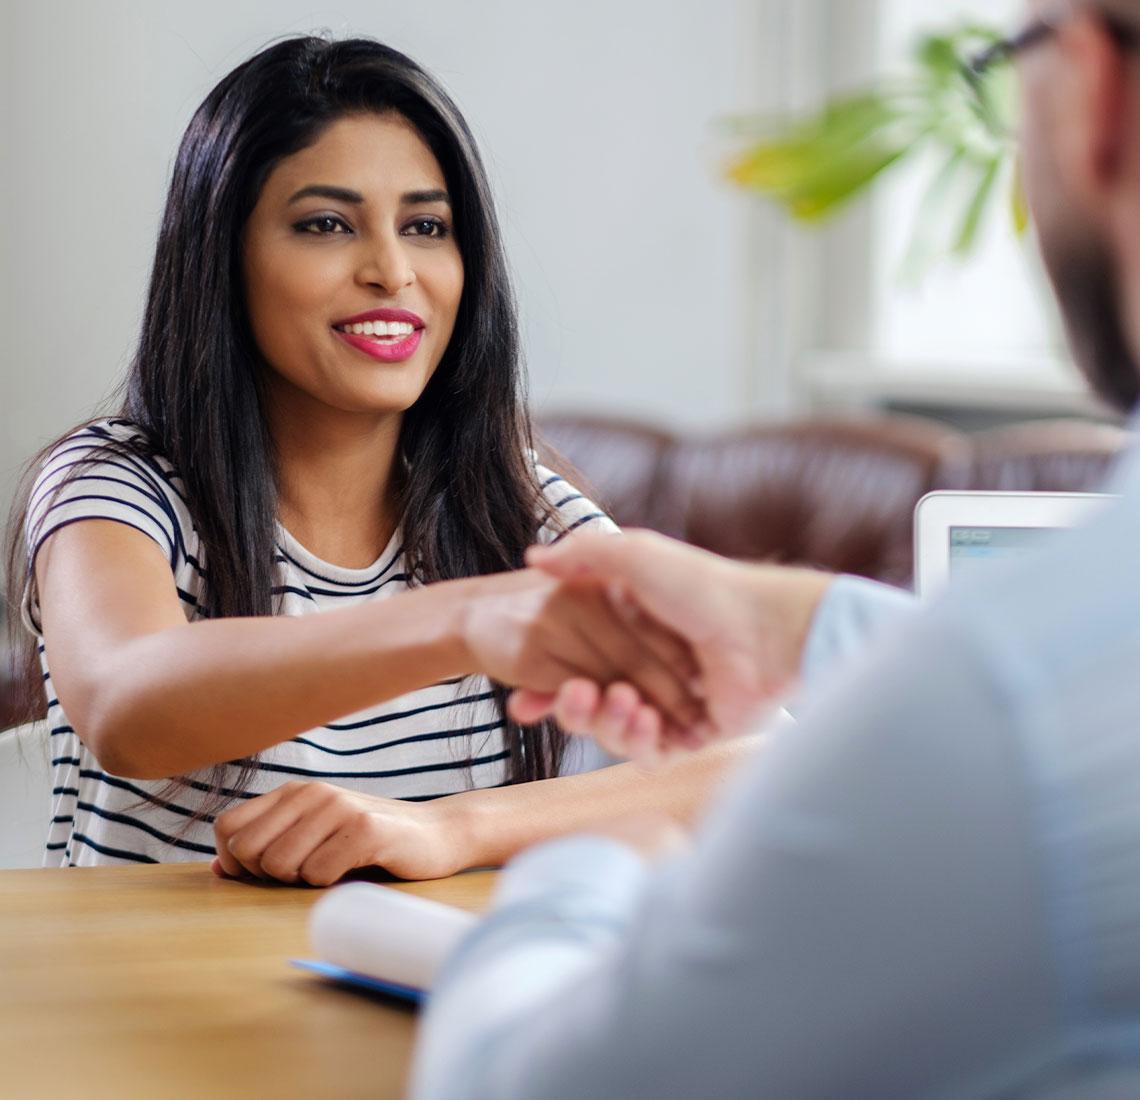 Improving hiring practices